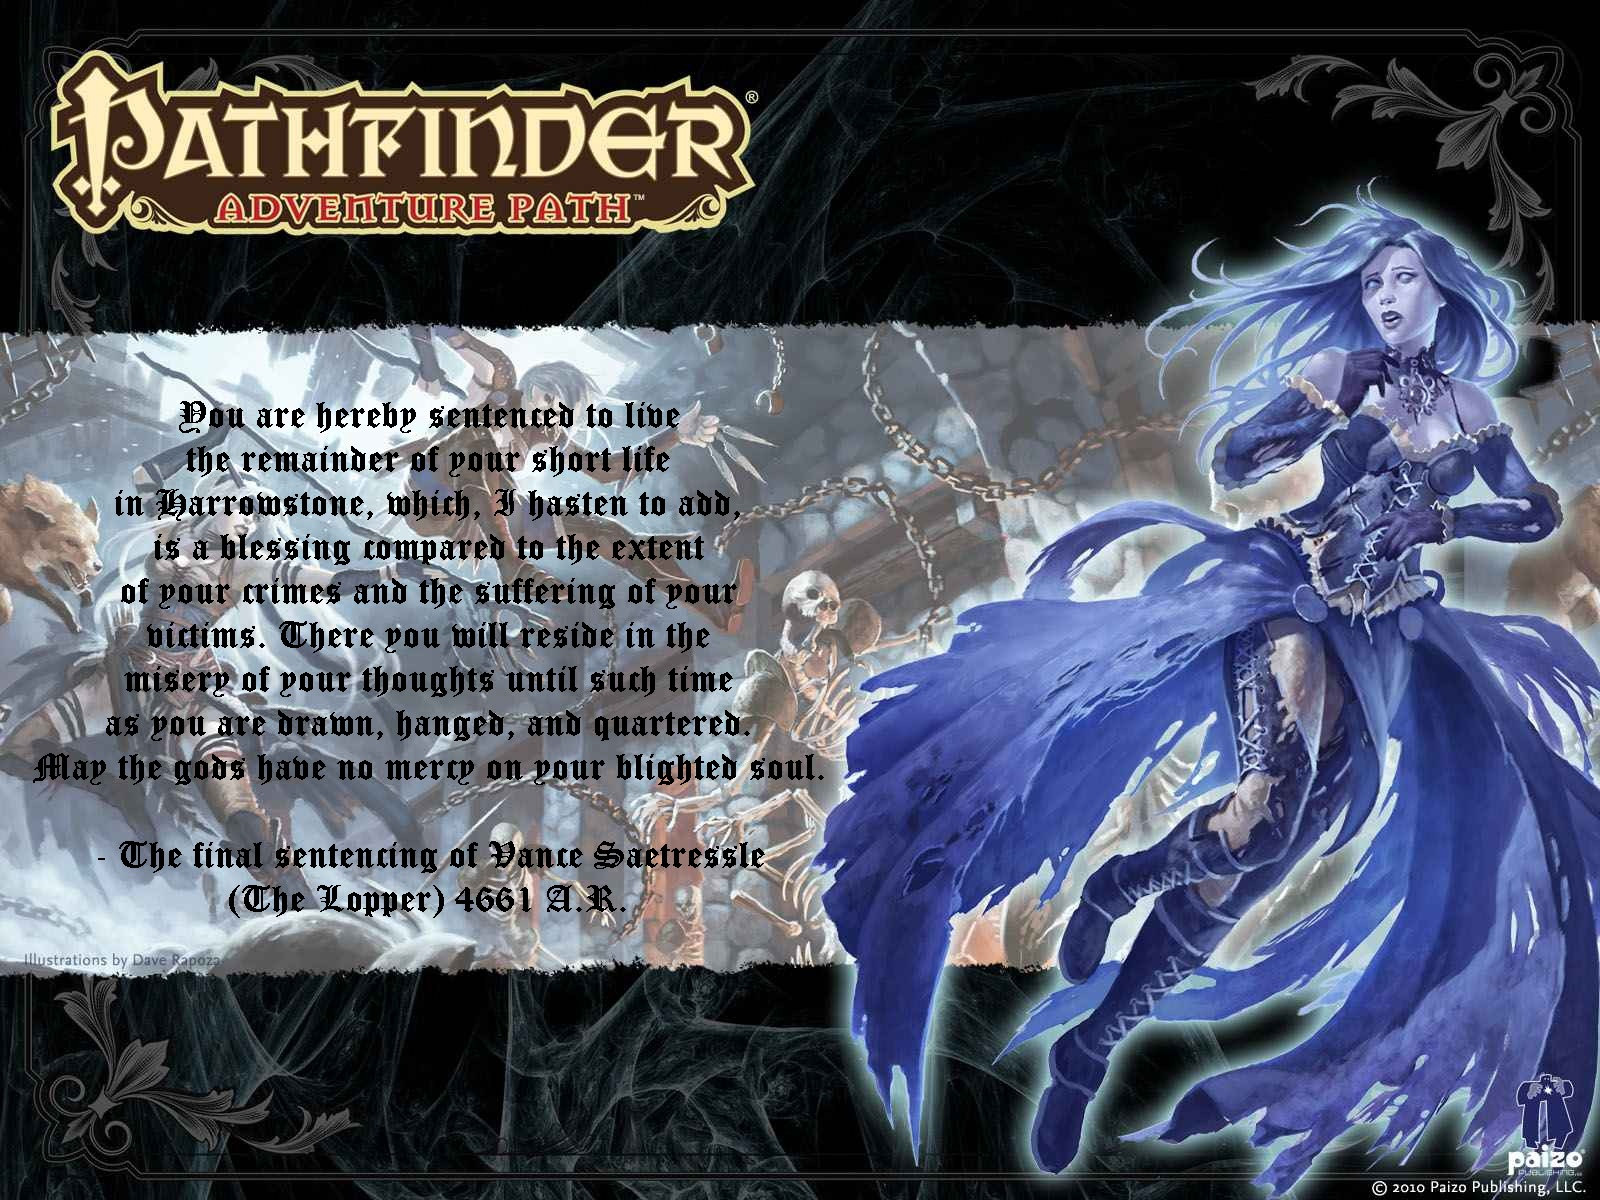 Free Download Top Pathfinder Rpg Wallpaper Wallpapers